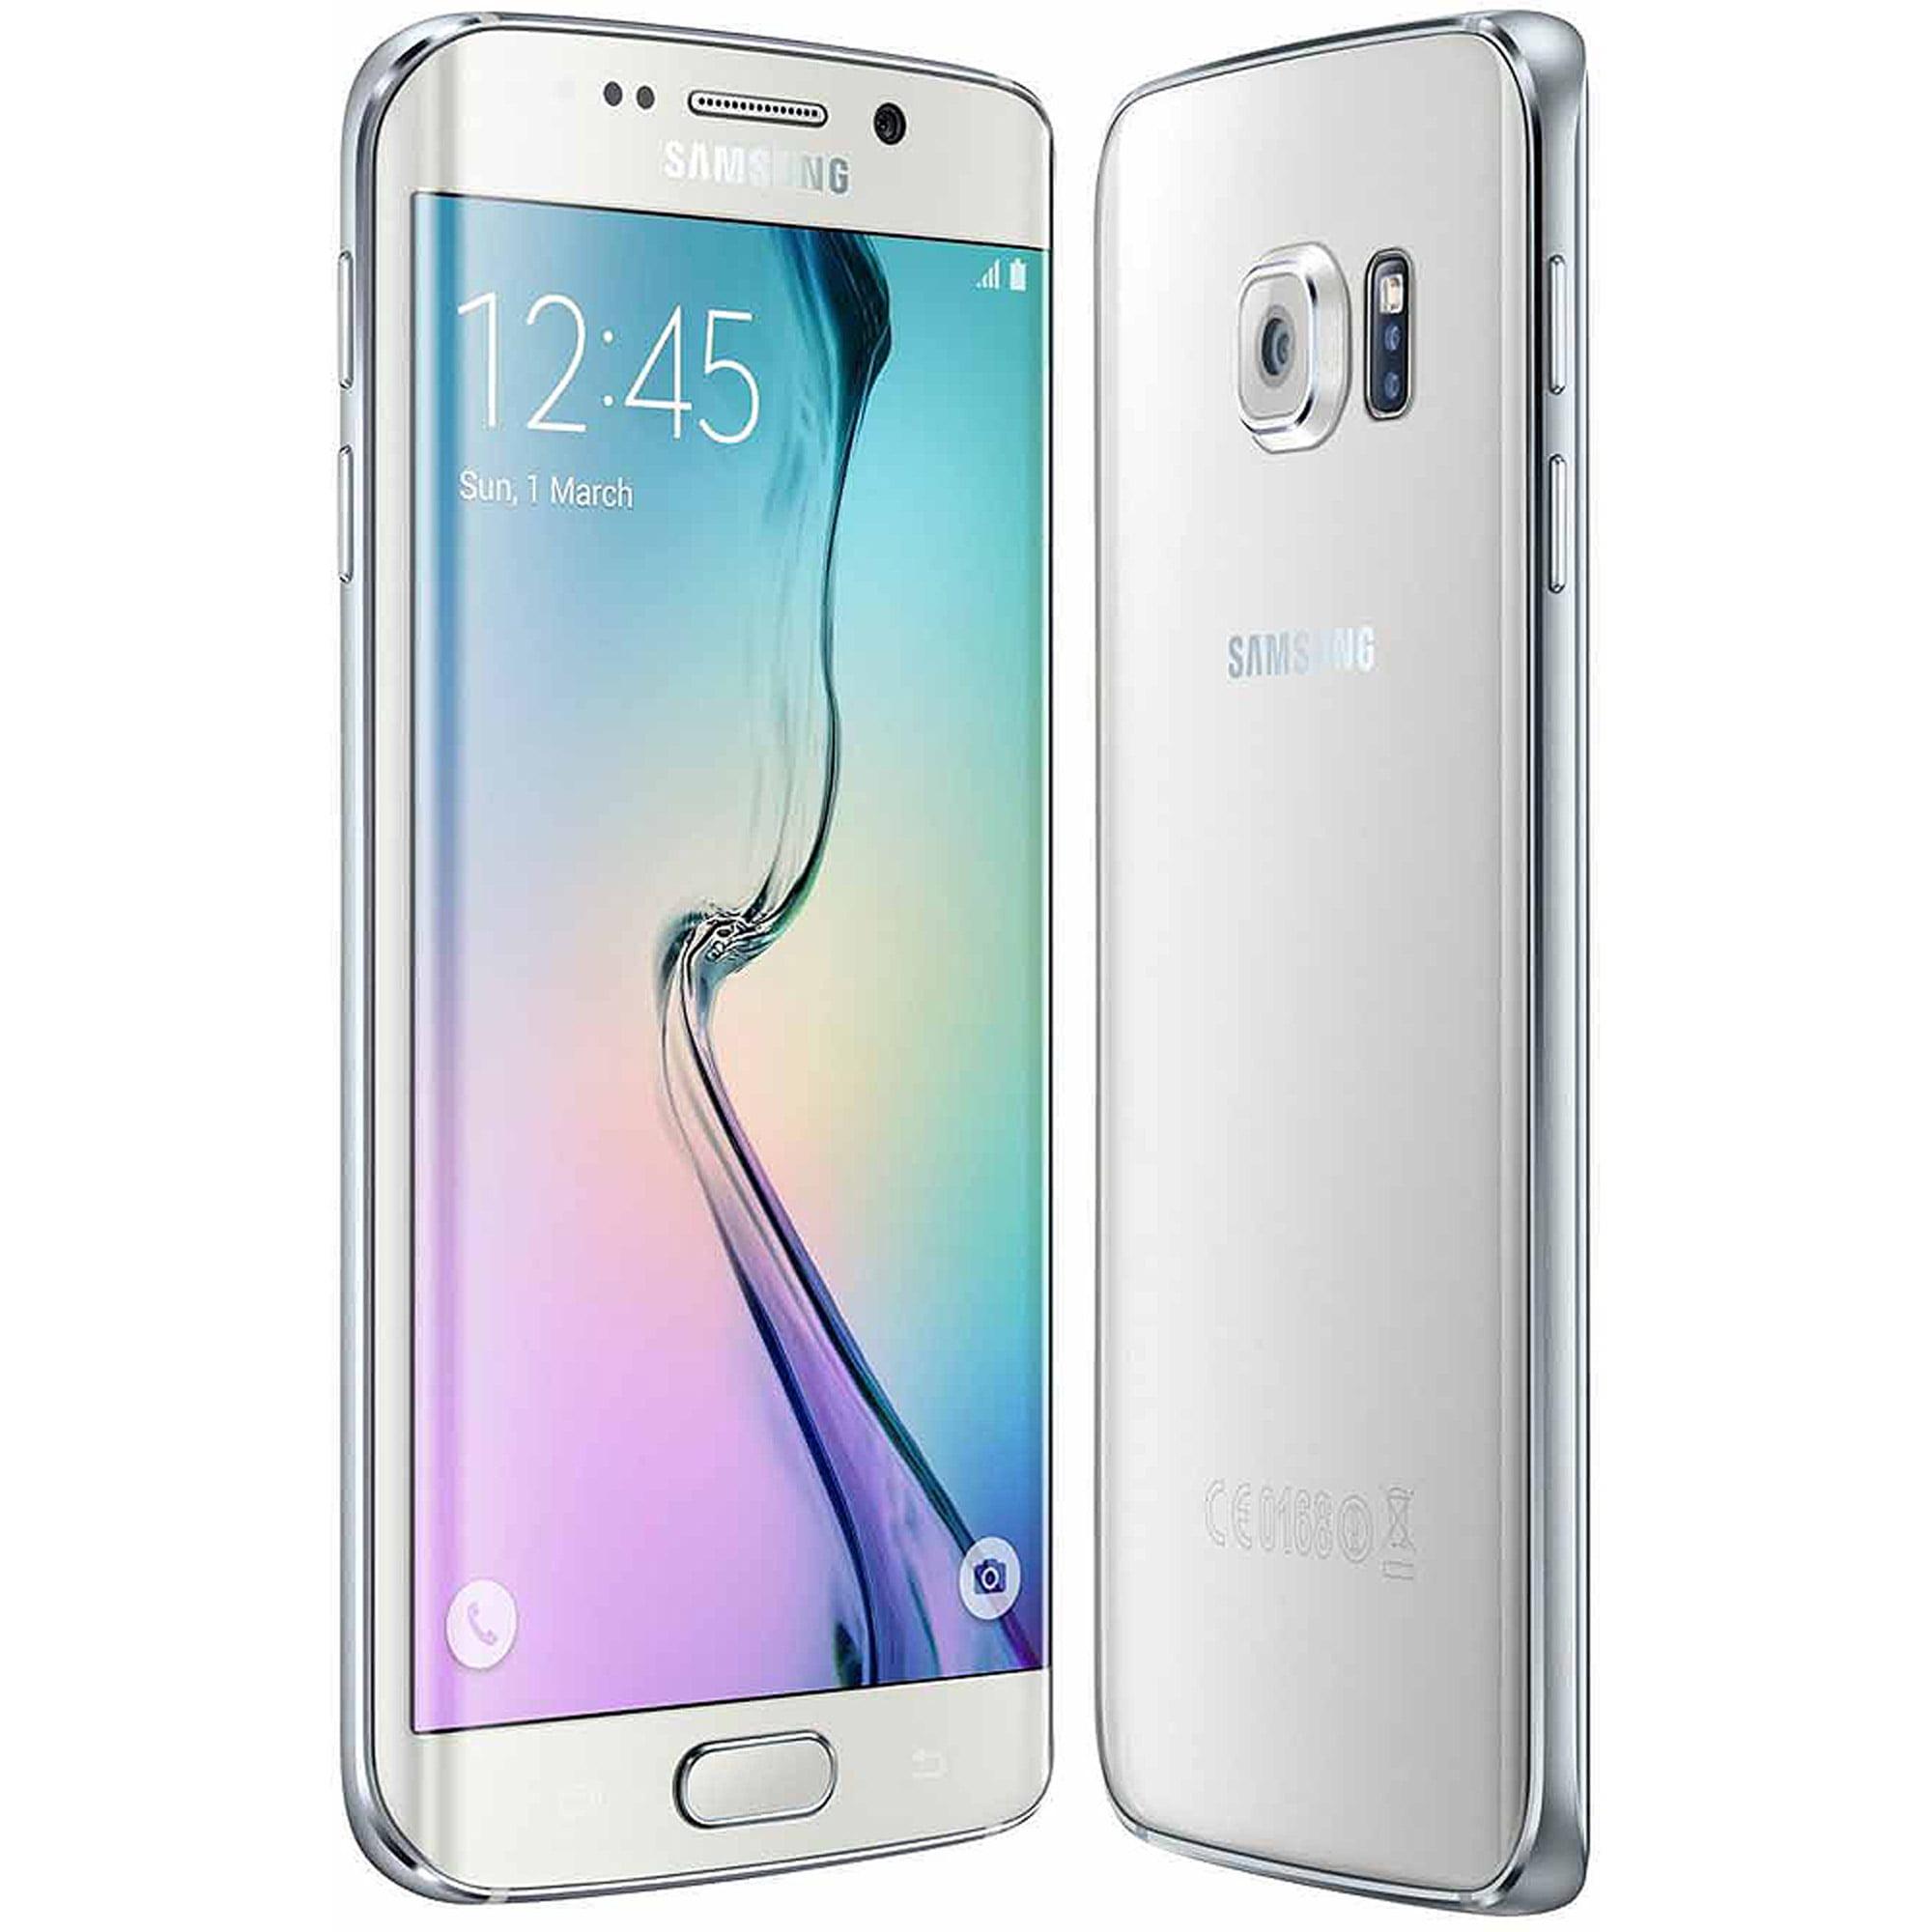 Samsung galaxy s6 - Samsung Galaxy S6 Edge G925 32gb Gsm 4g Lte Octa Core Smartphone Unlocked Walmart Com